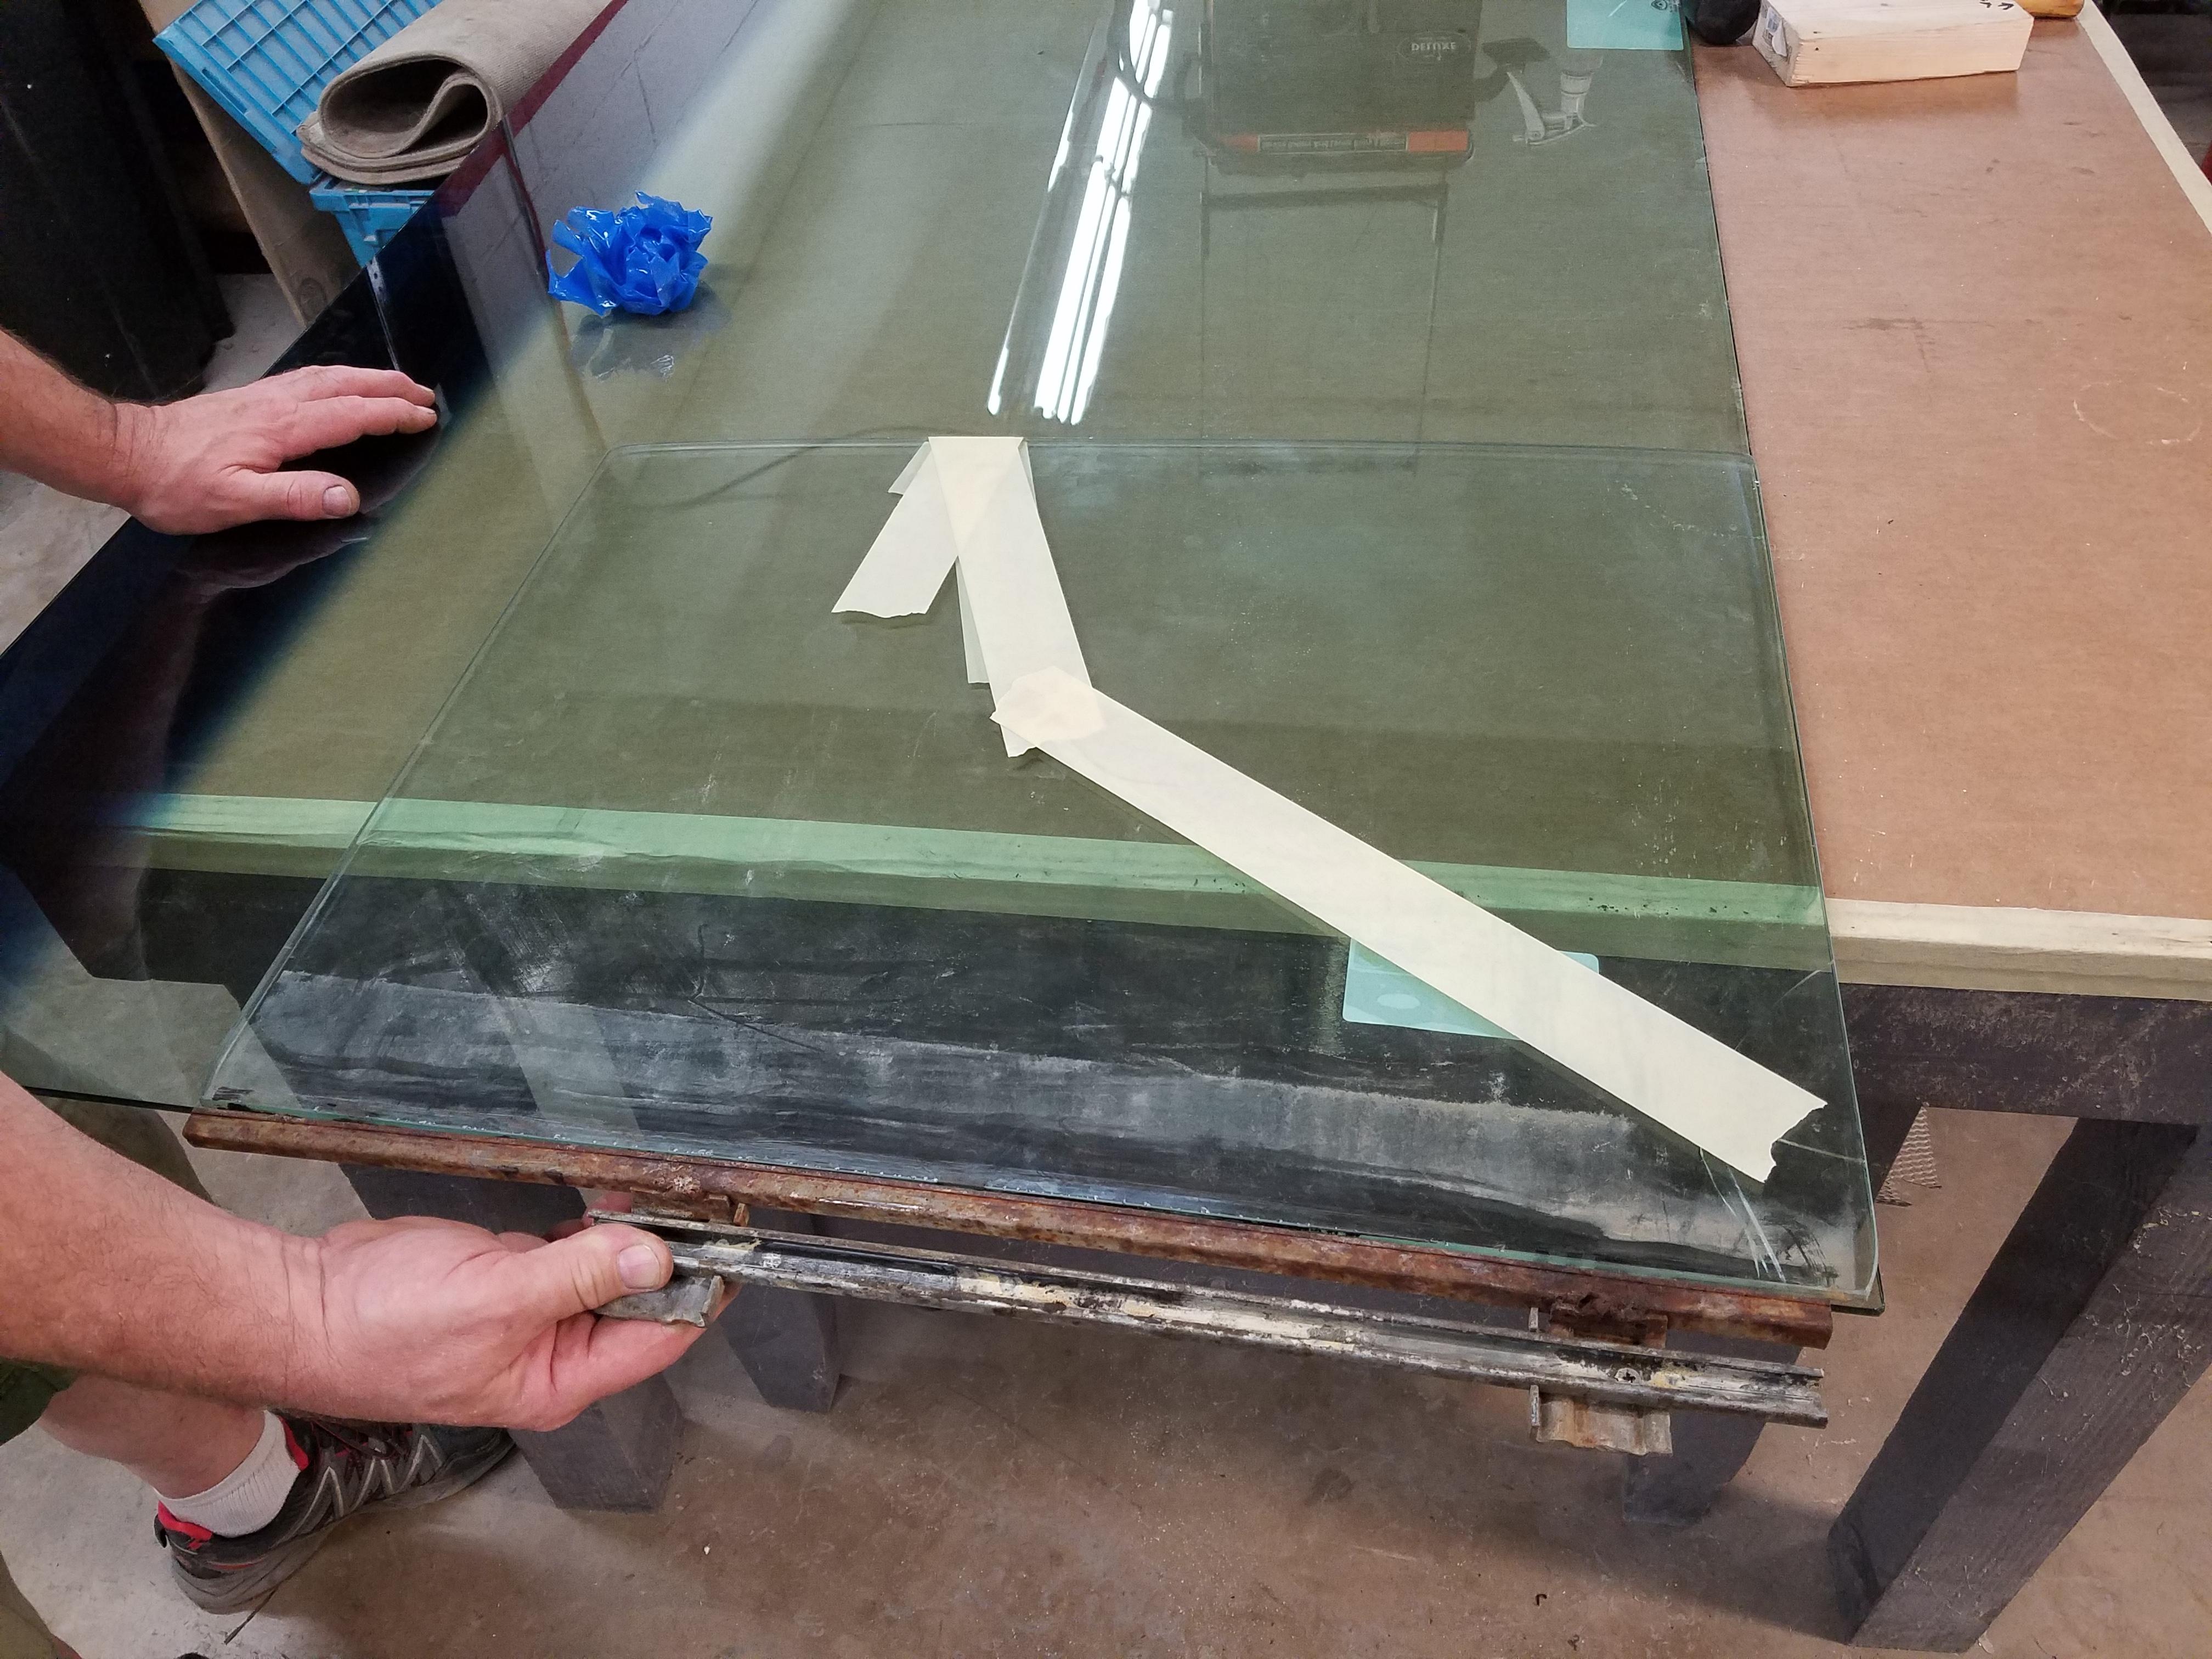 Damaged side glass